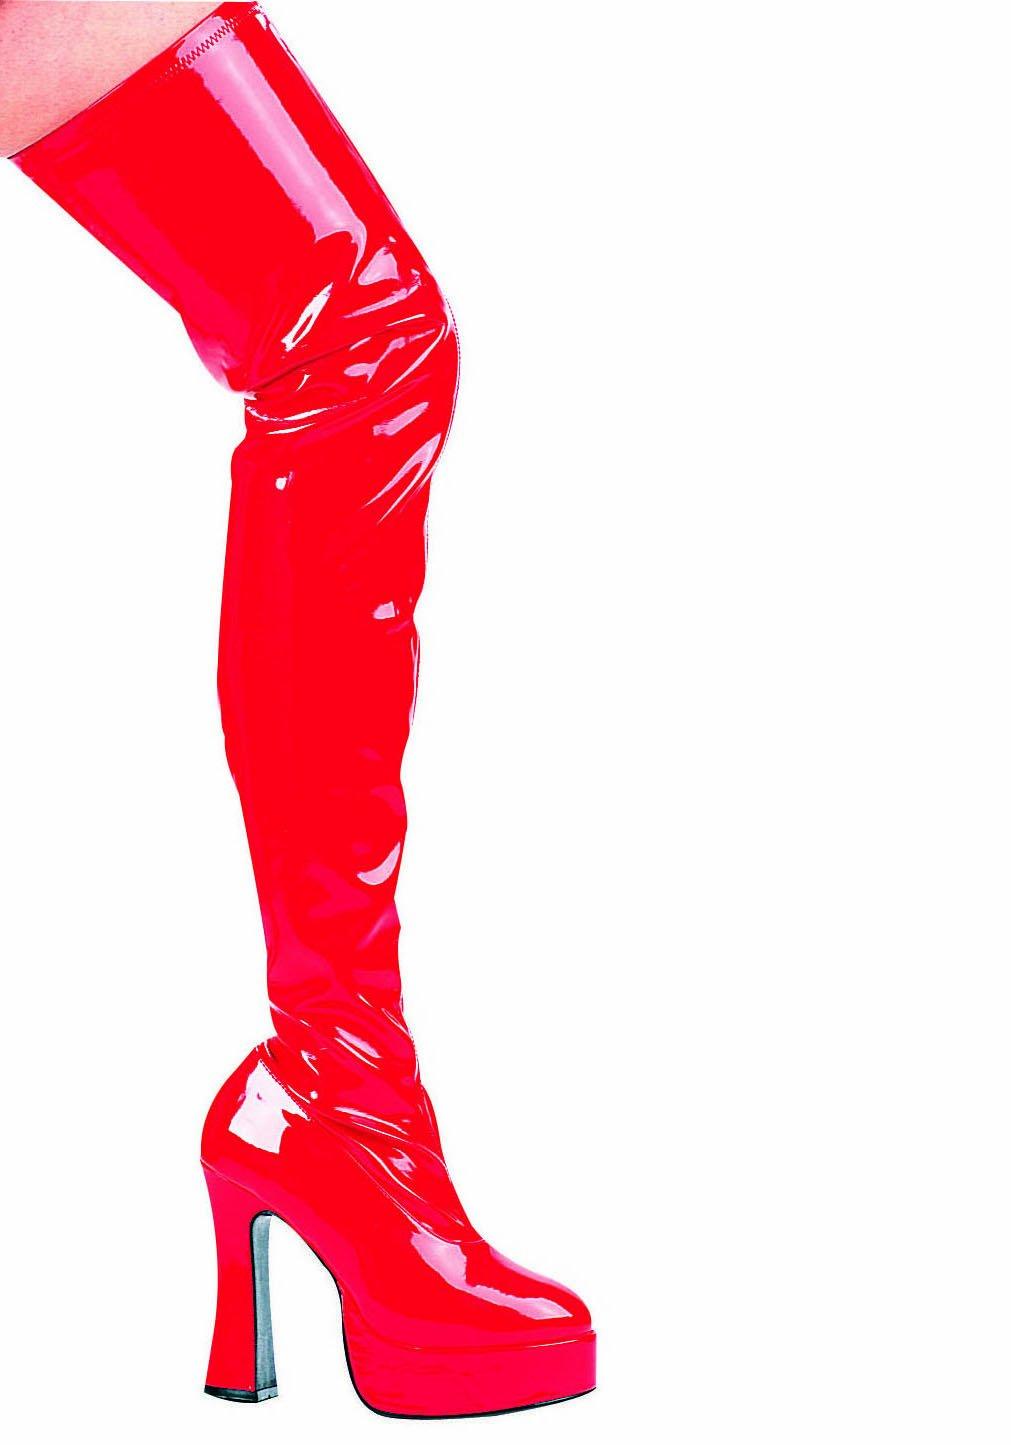 db9fee15439b7b Ellie Shoes Women s Thrill Boot B00DGQKXIY B00DGQKXIY B00DGQKXIY 11 M US